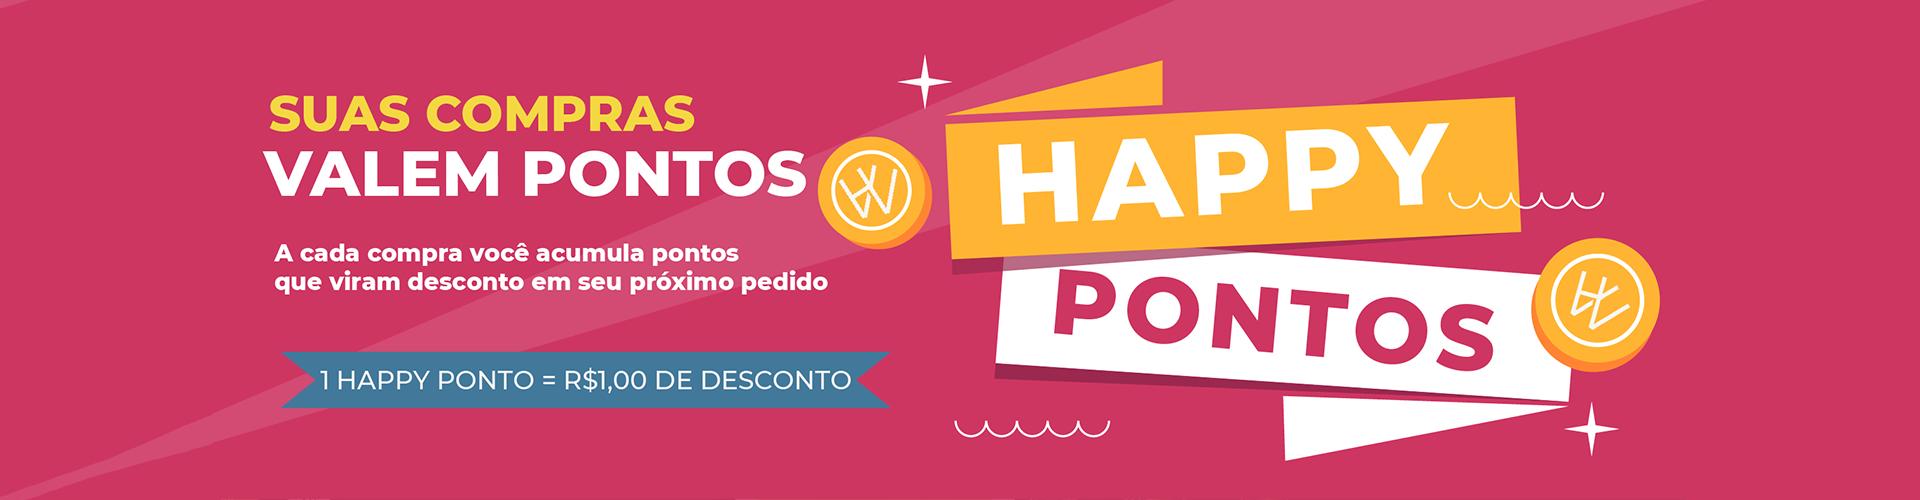 Happy Pontos